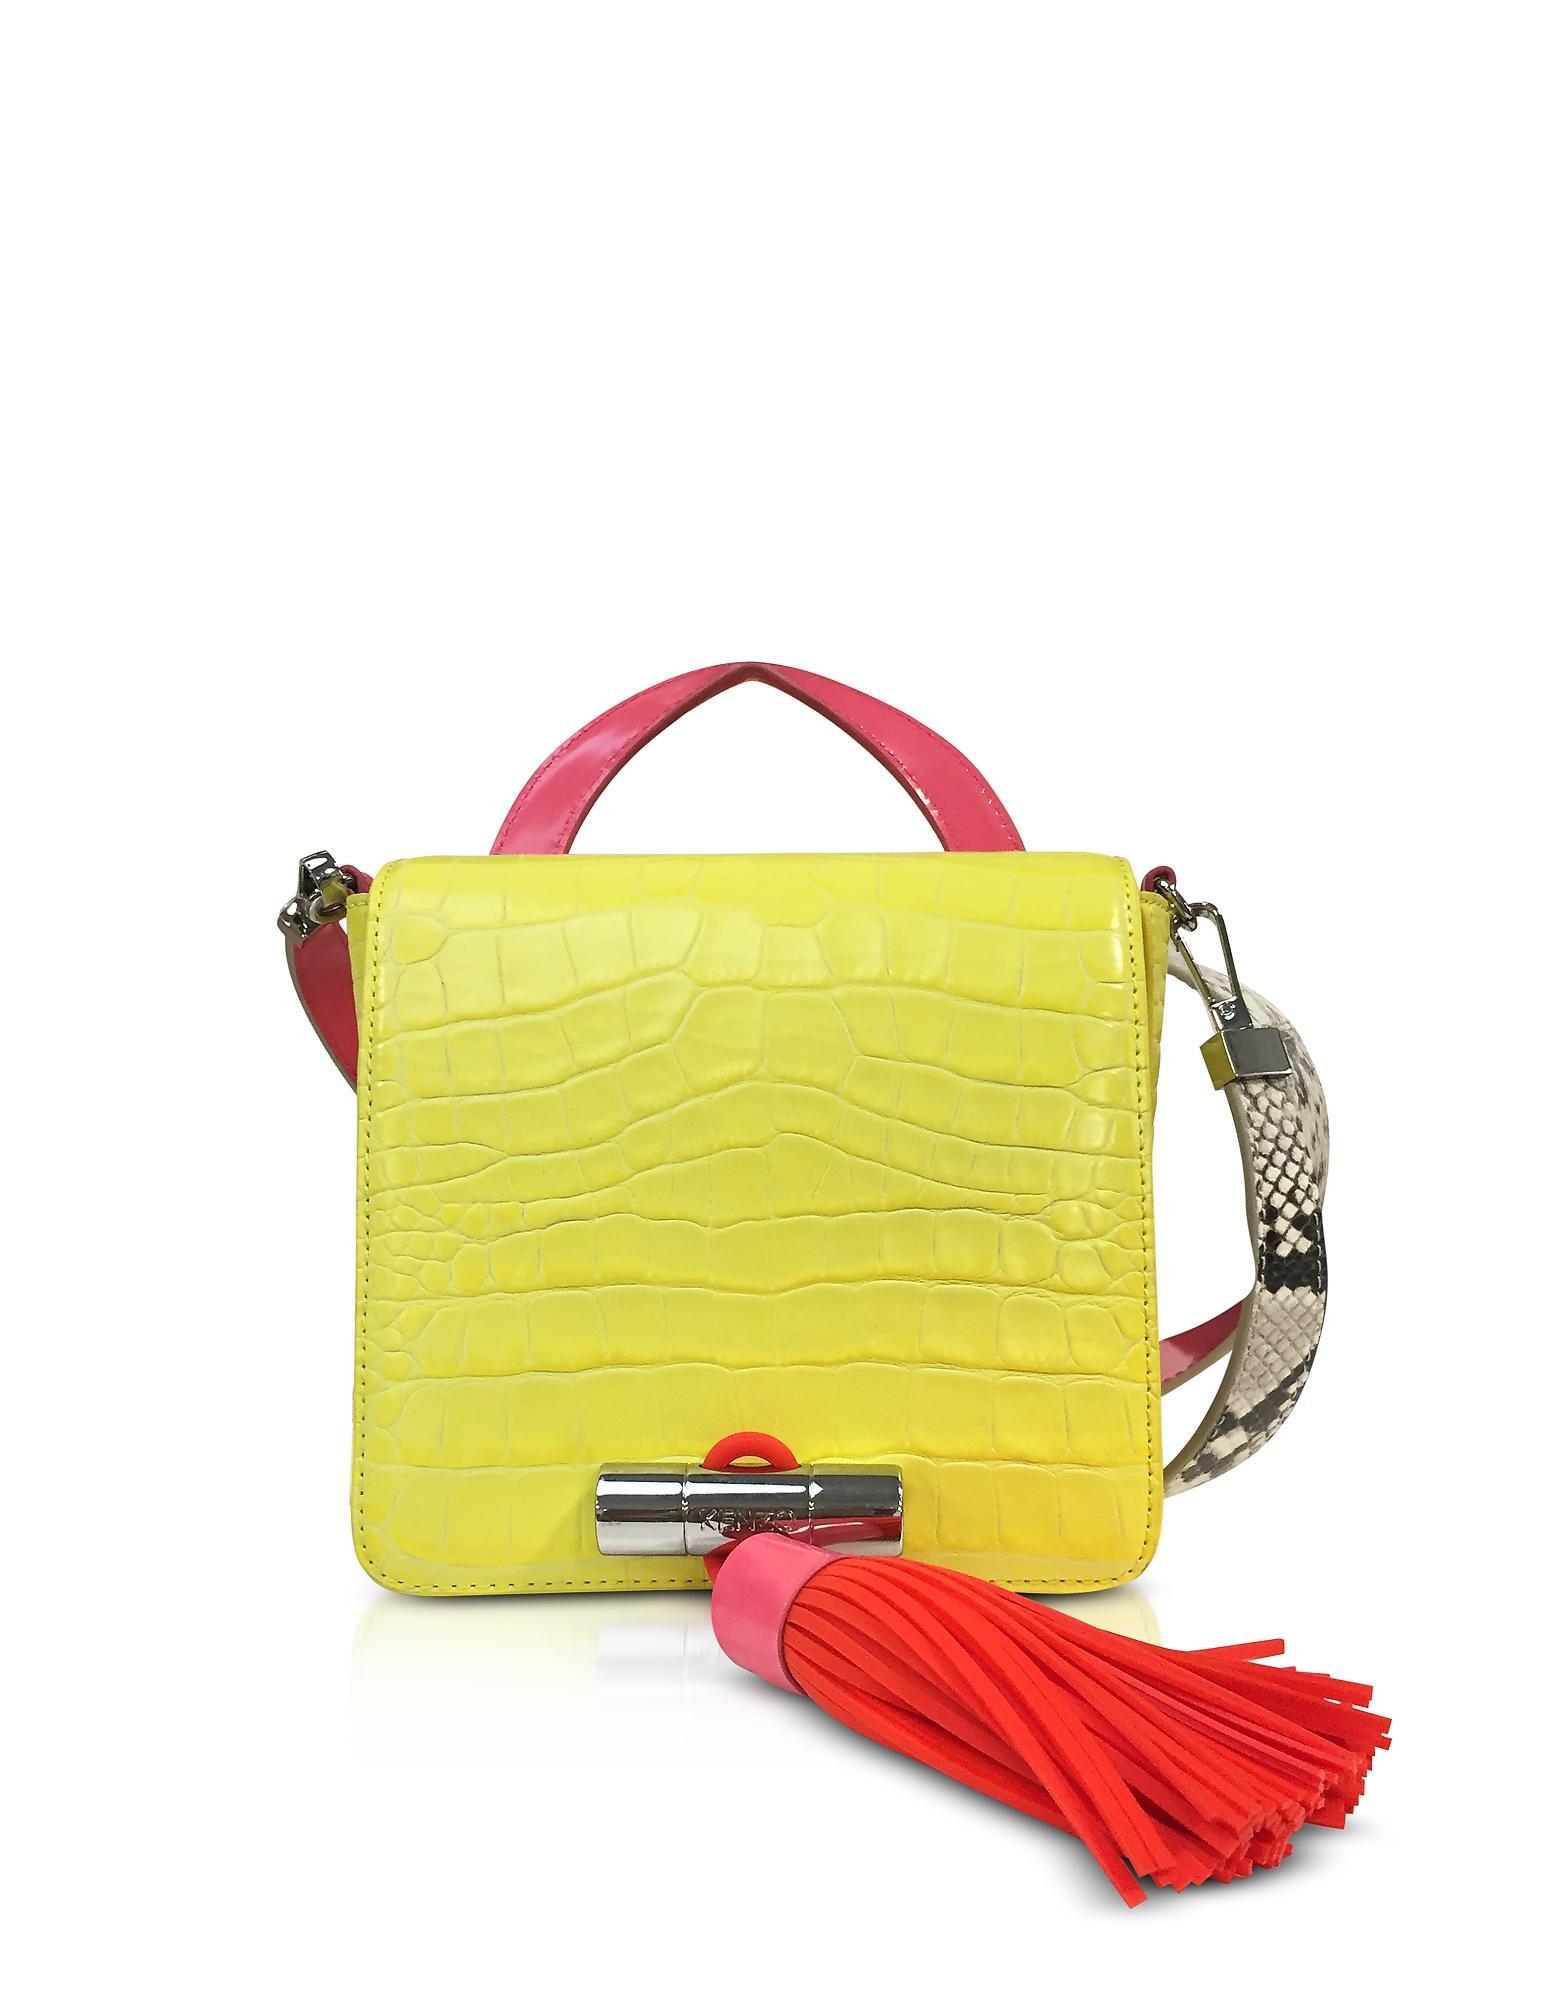 09434ace8b Kenzo Lemon Croco Embossed Leather Mini Sailor Bag W/Fuchsia Oversized  Tassel